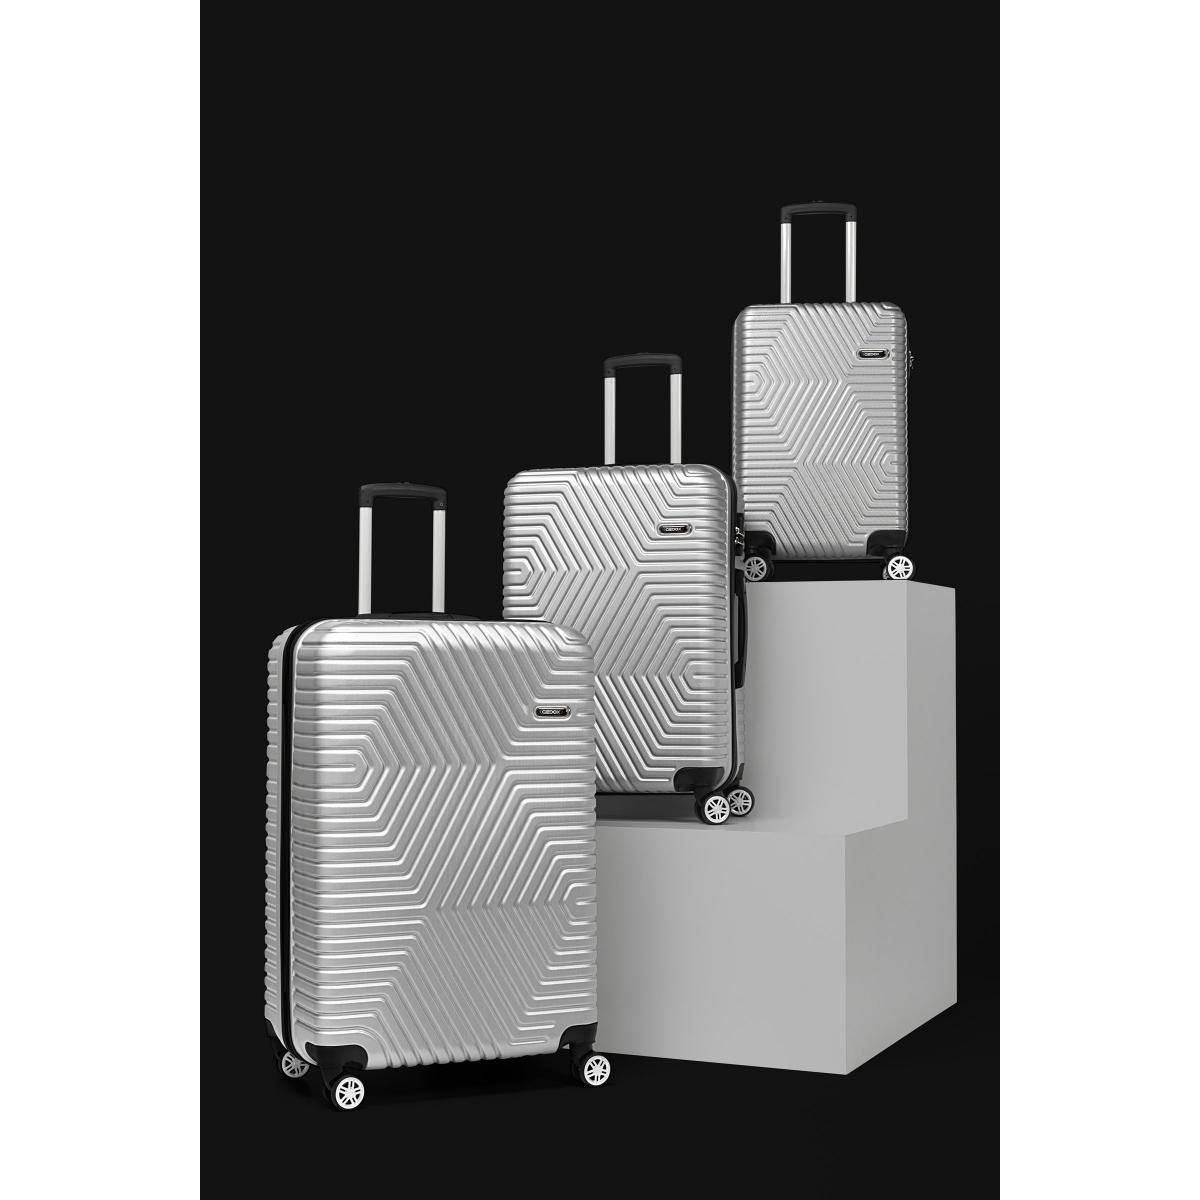 G&D Polo Suitcase ABS 3'lü Lüx Valiz Seyahat Seti - Model:600.03 Gri